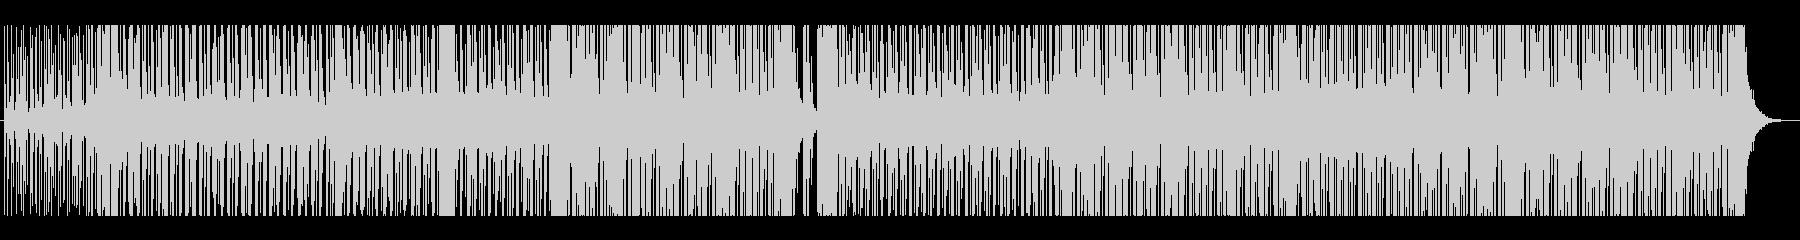 Dance, rhythmic, drum's unreproduced waveform